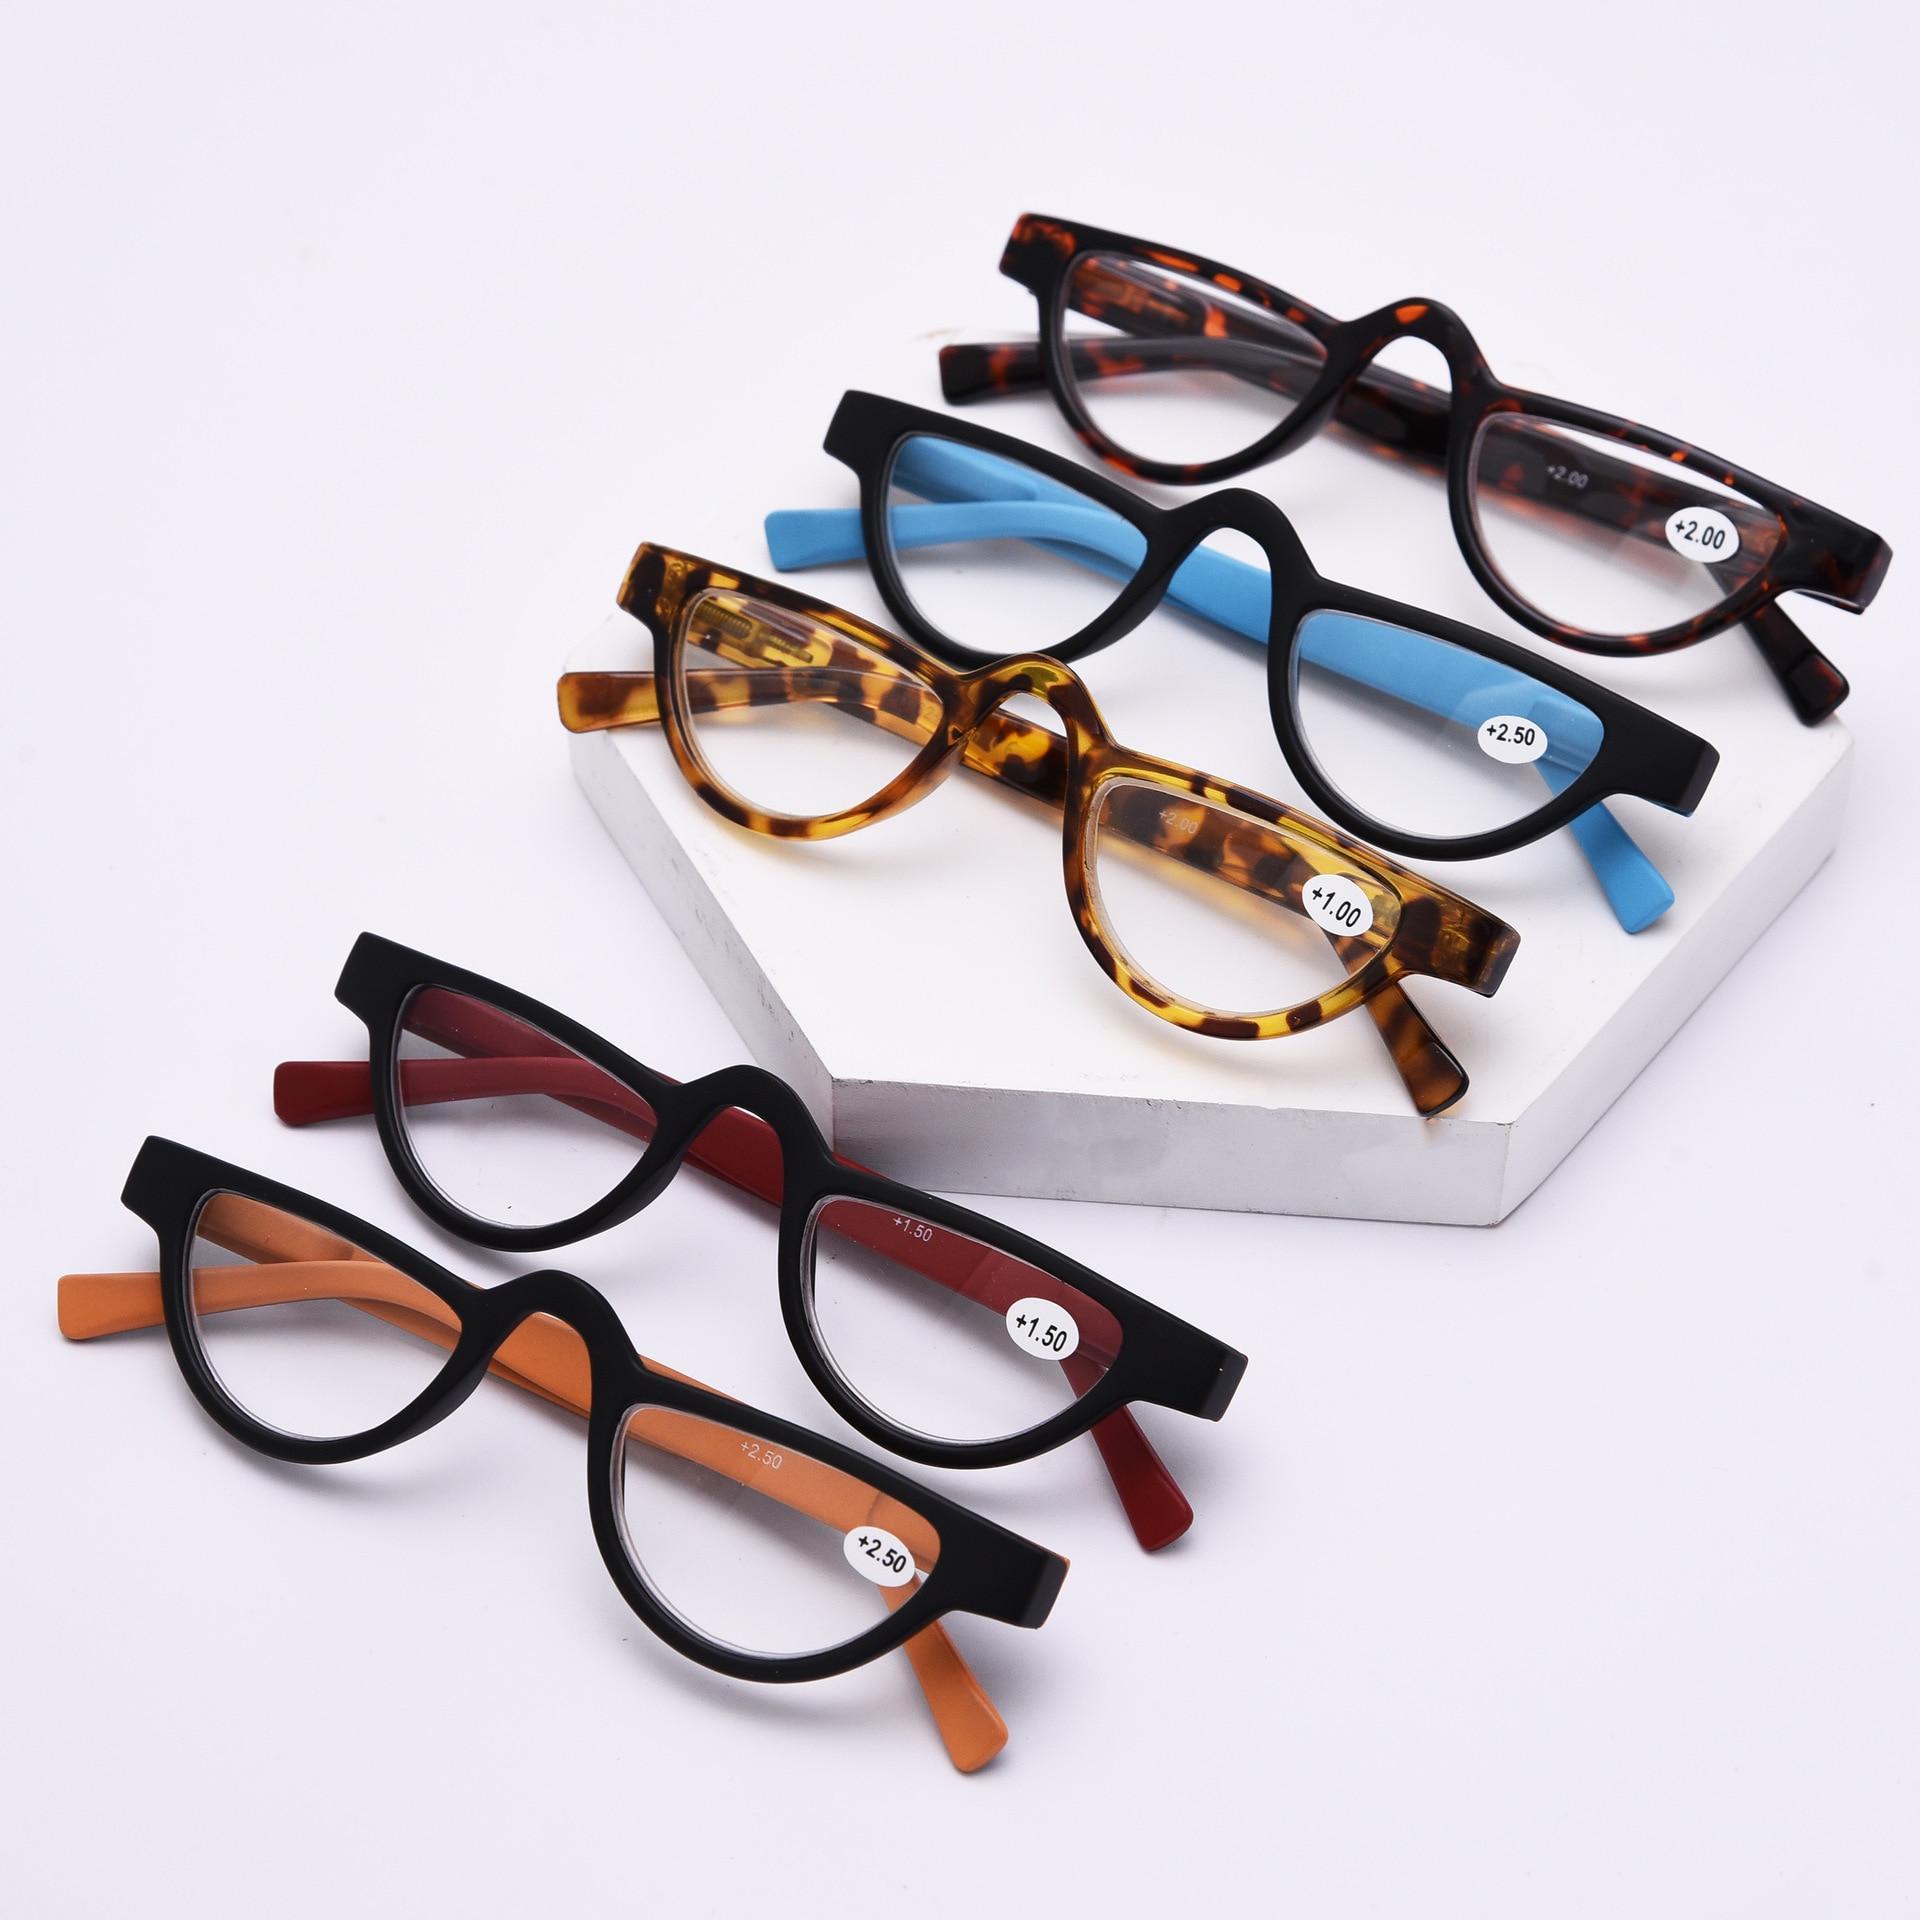 Retro Cat Eye Slender Men Women Reading Plastic Slingshot Glasses +1.0 +1.5 +2.0 +2.5 +3.50 Presbyopic Gafas Lunettes De Lecture